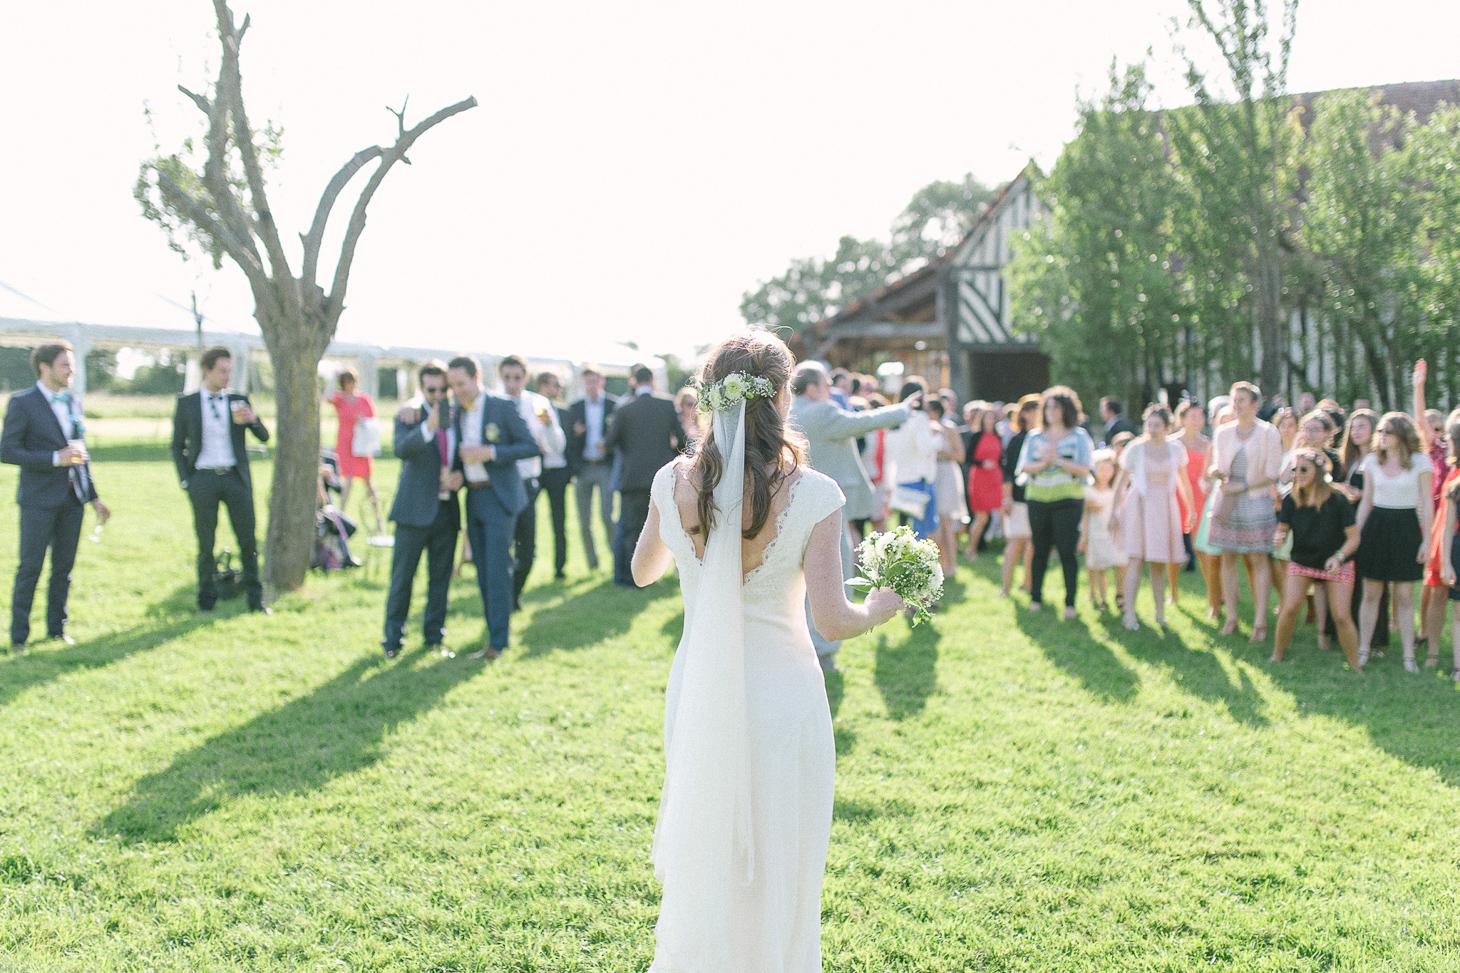 photographe-mariage-champ-de-launay-normandie-00047